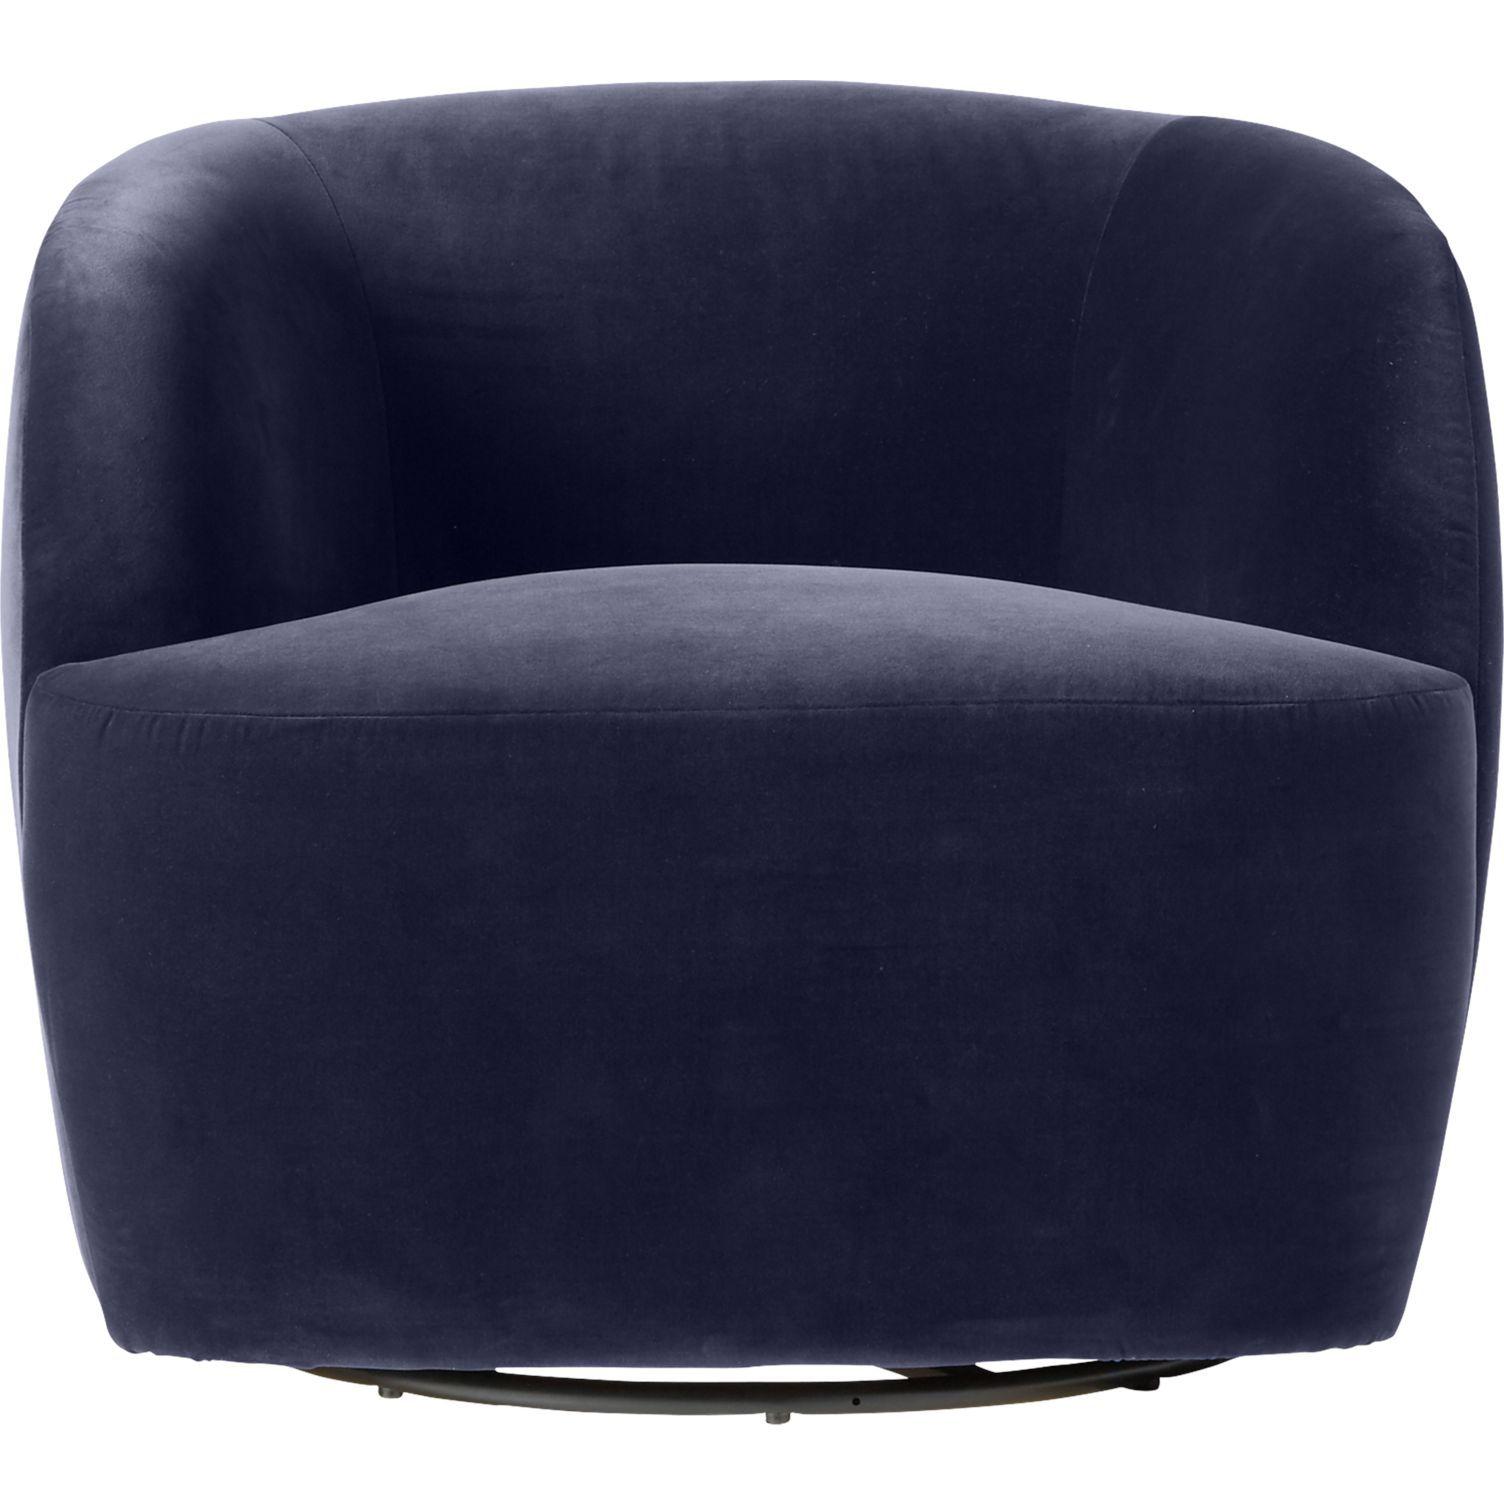 Gwyneth Navy Velvet Chair